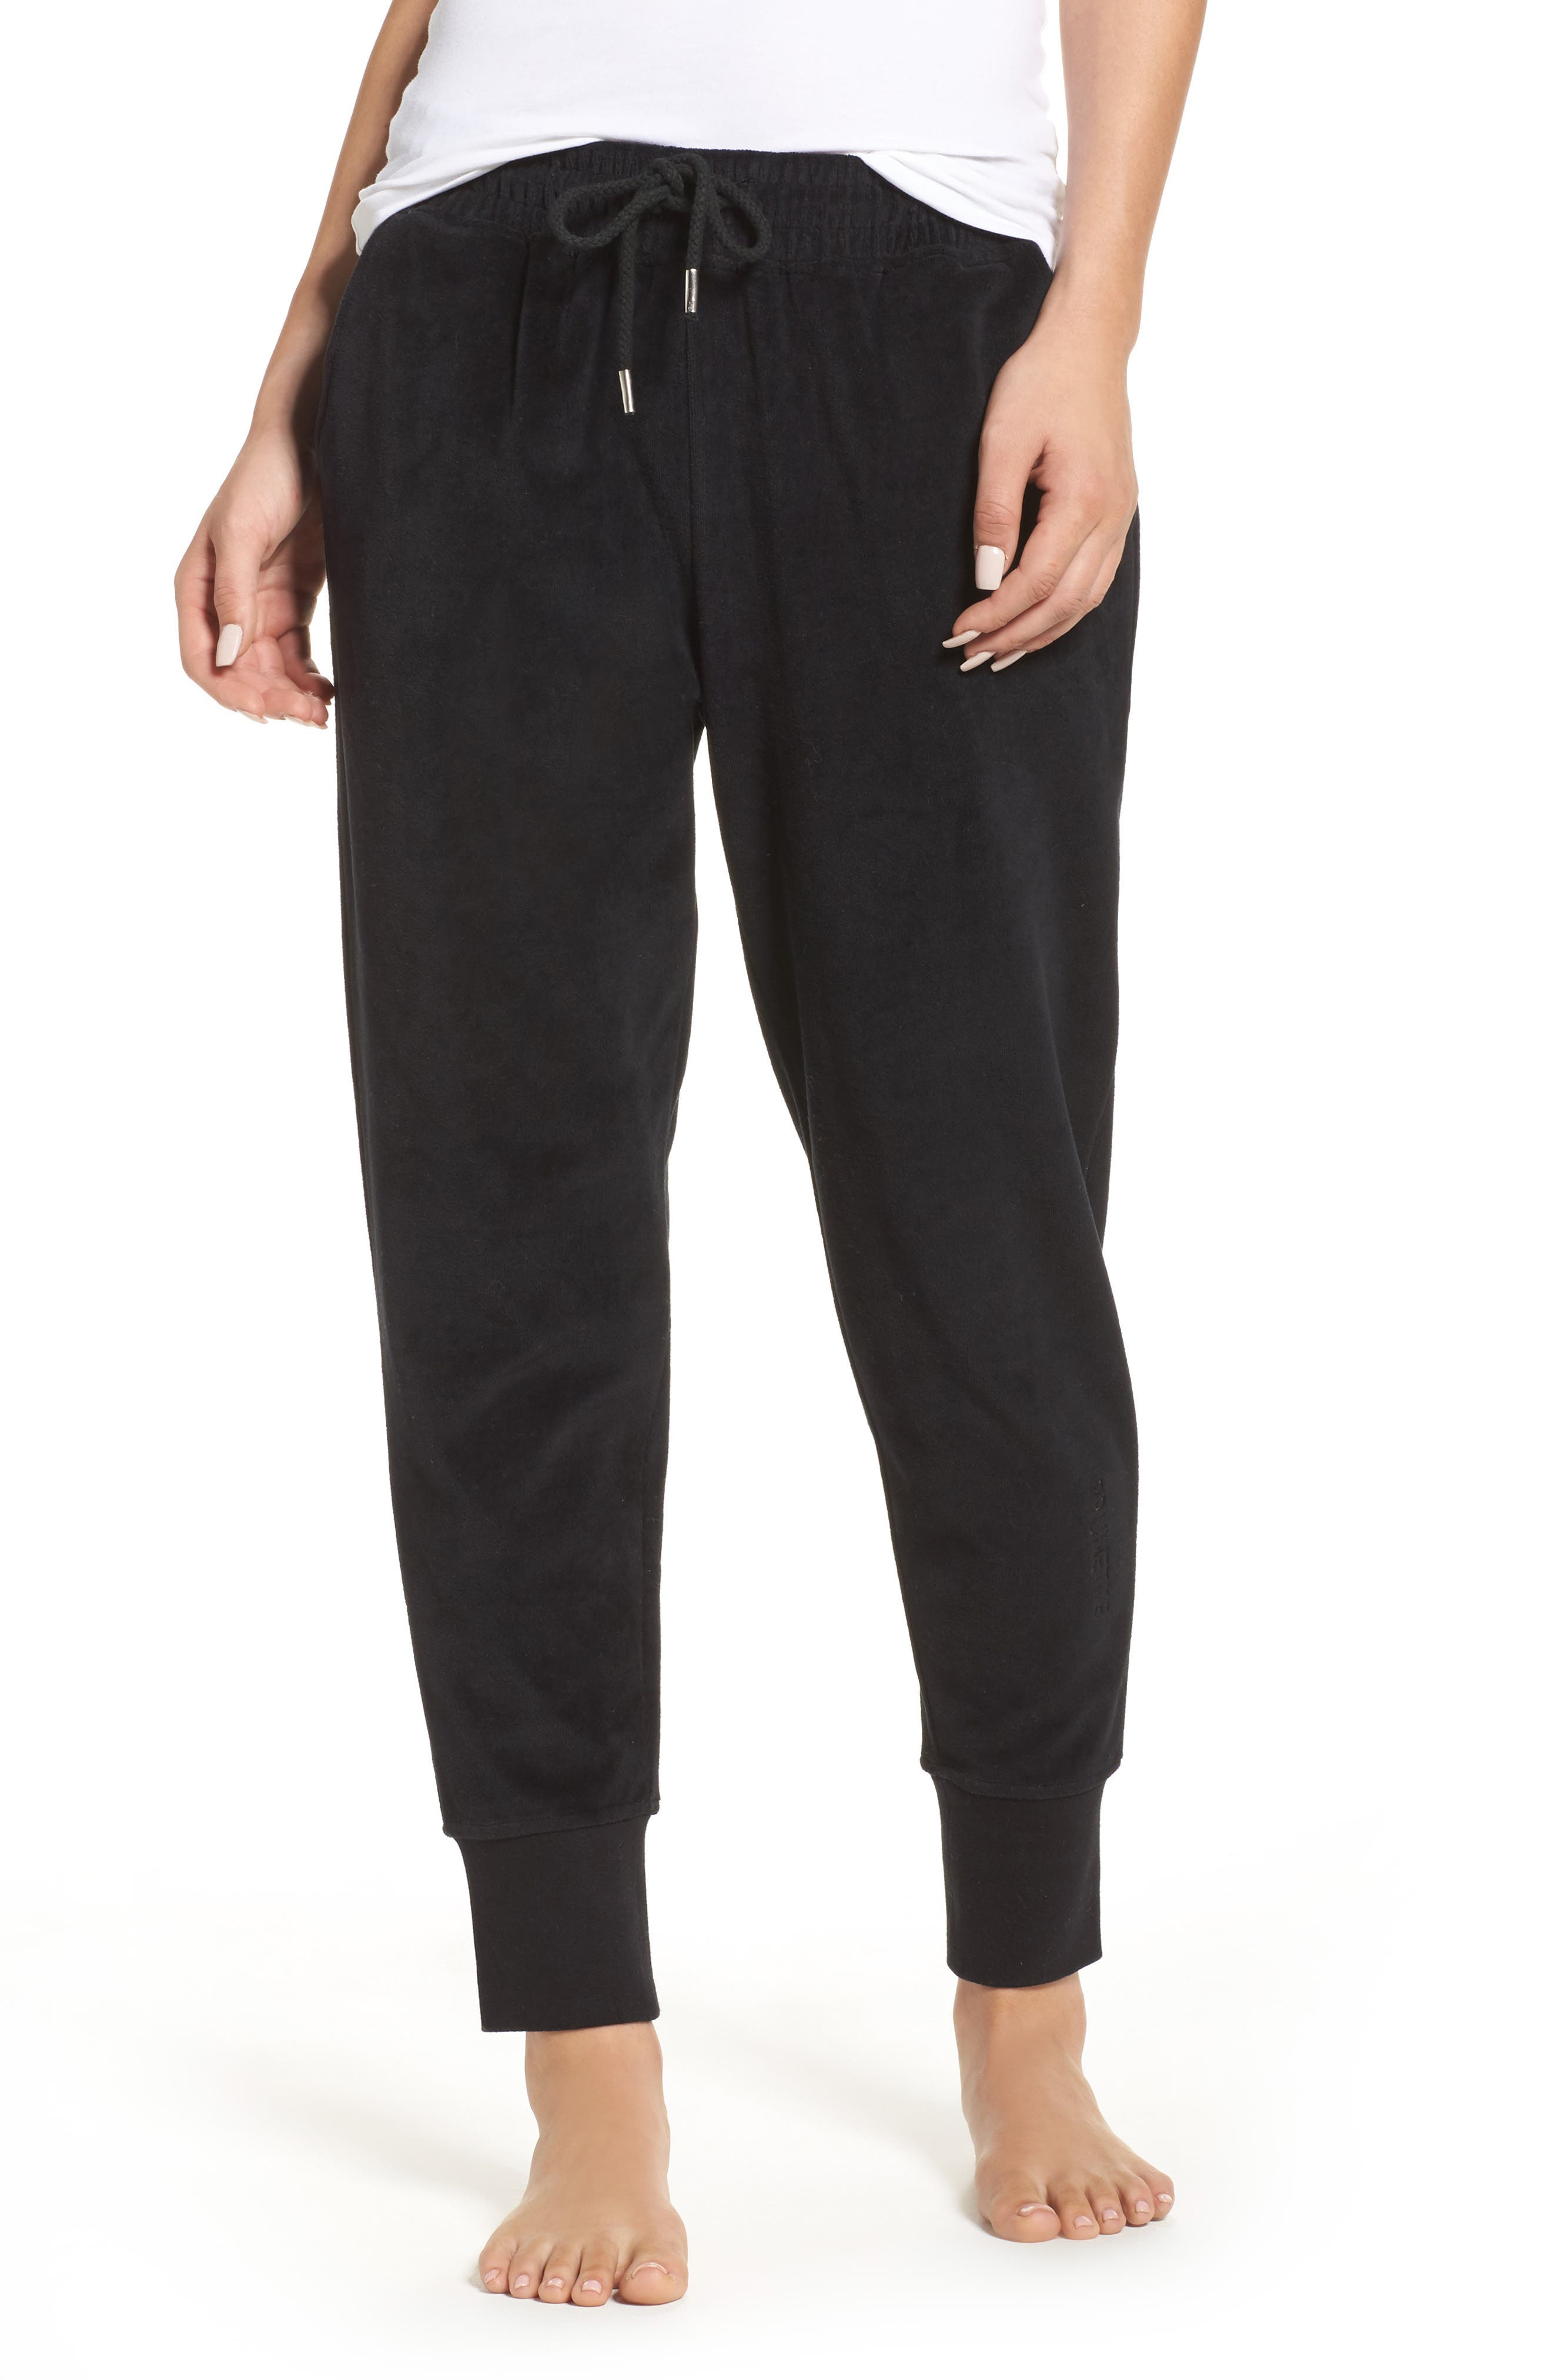 Brunette Embroidered Velour Jogger Pants,                         Main,                         color, 001